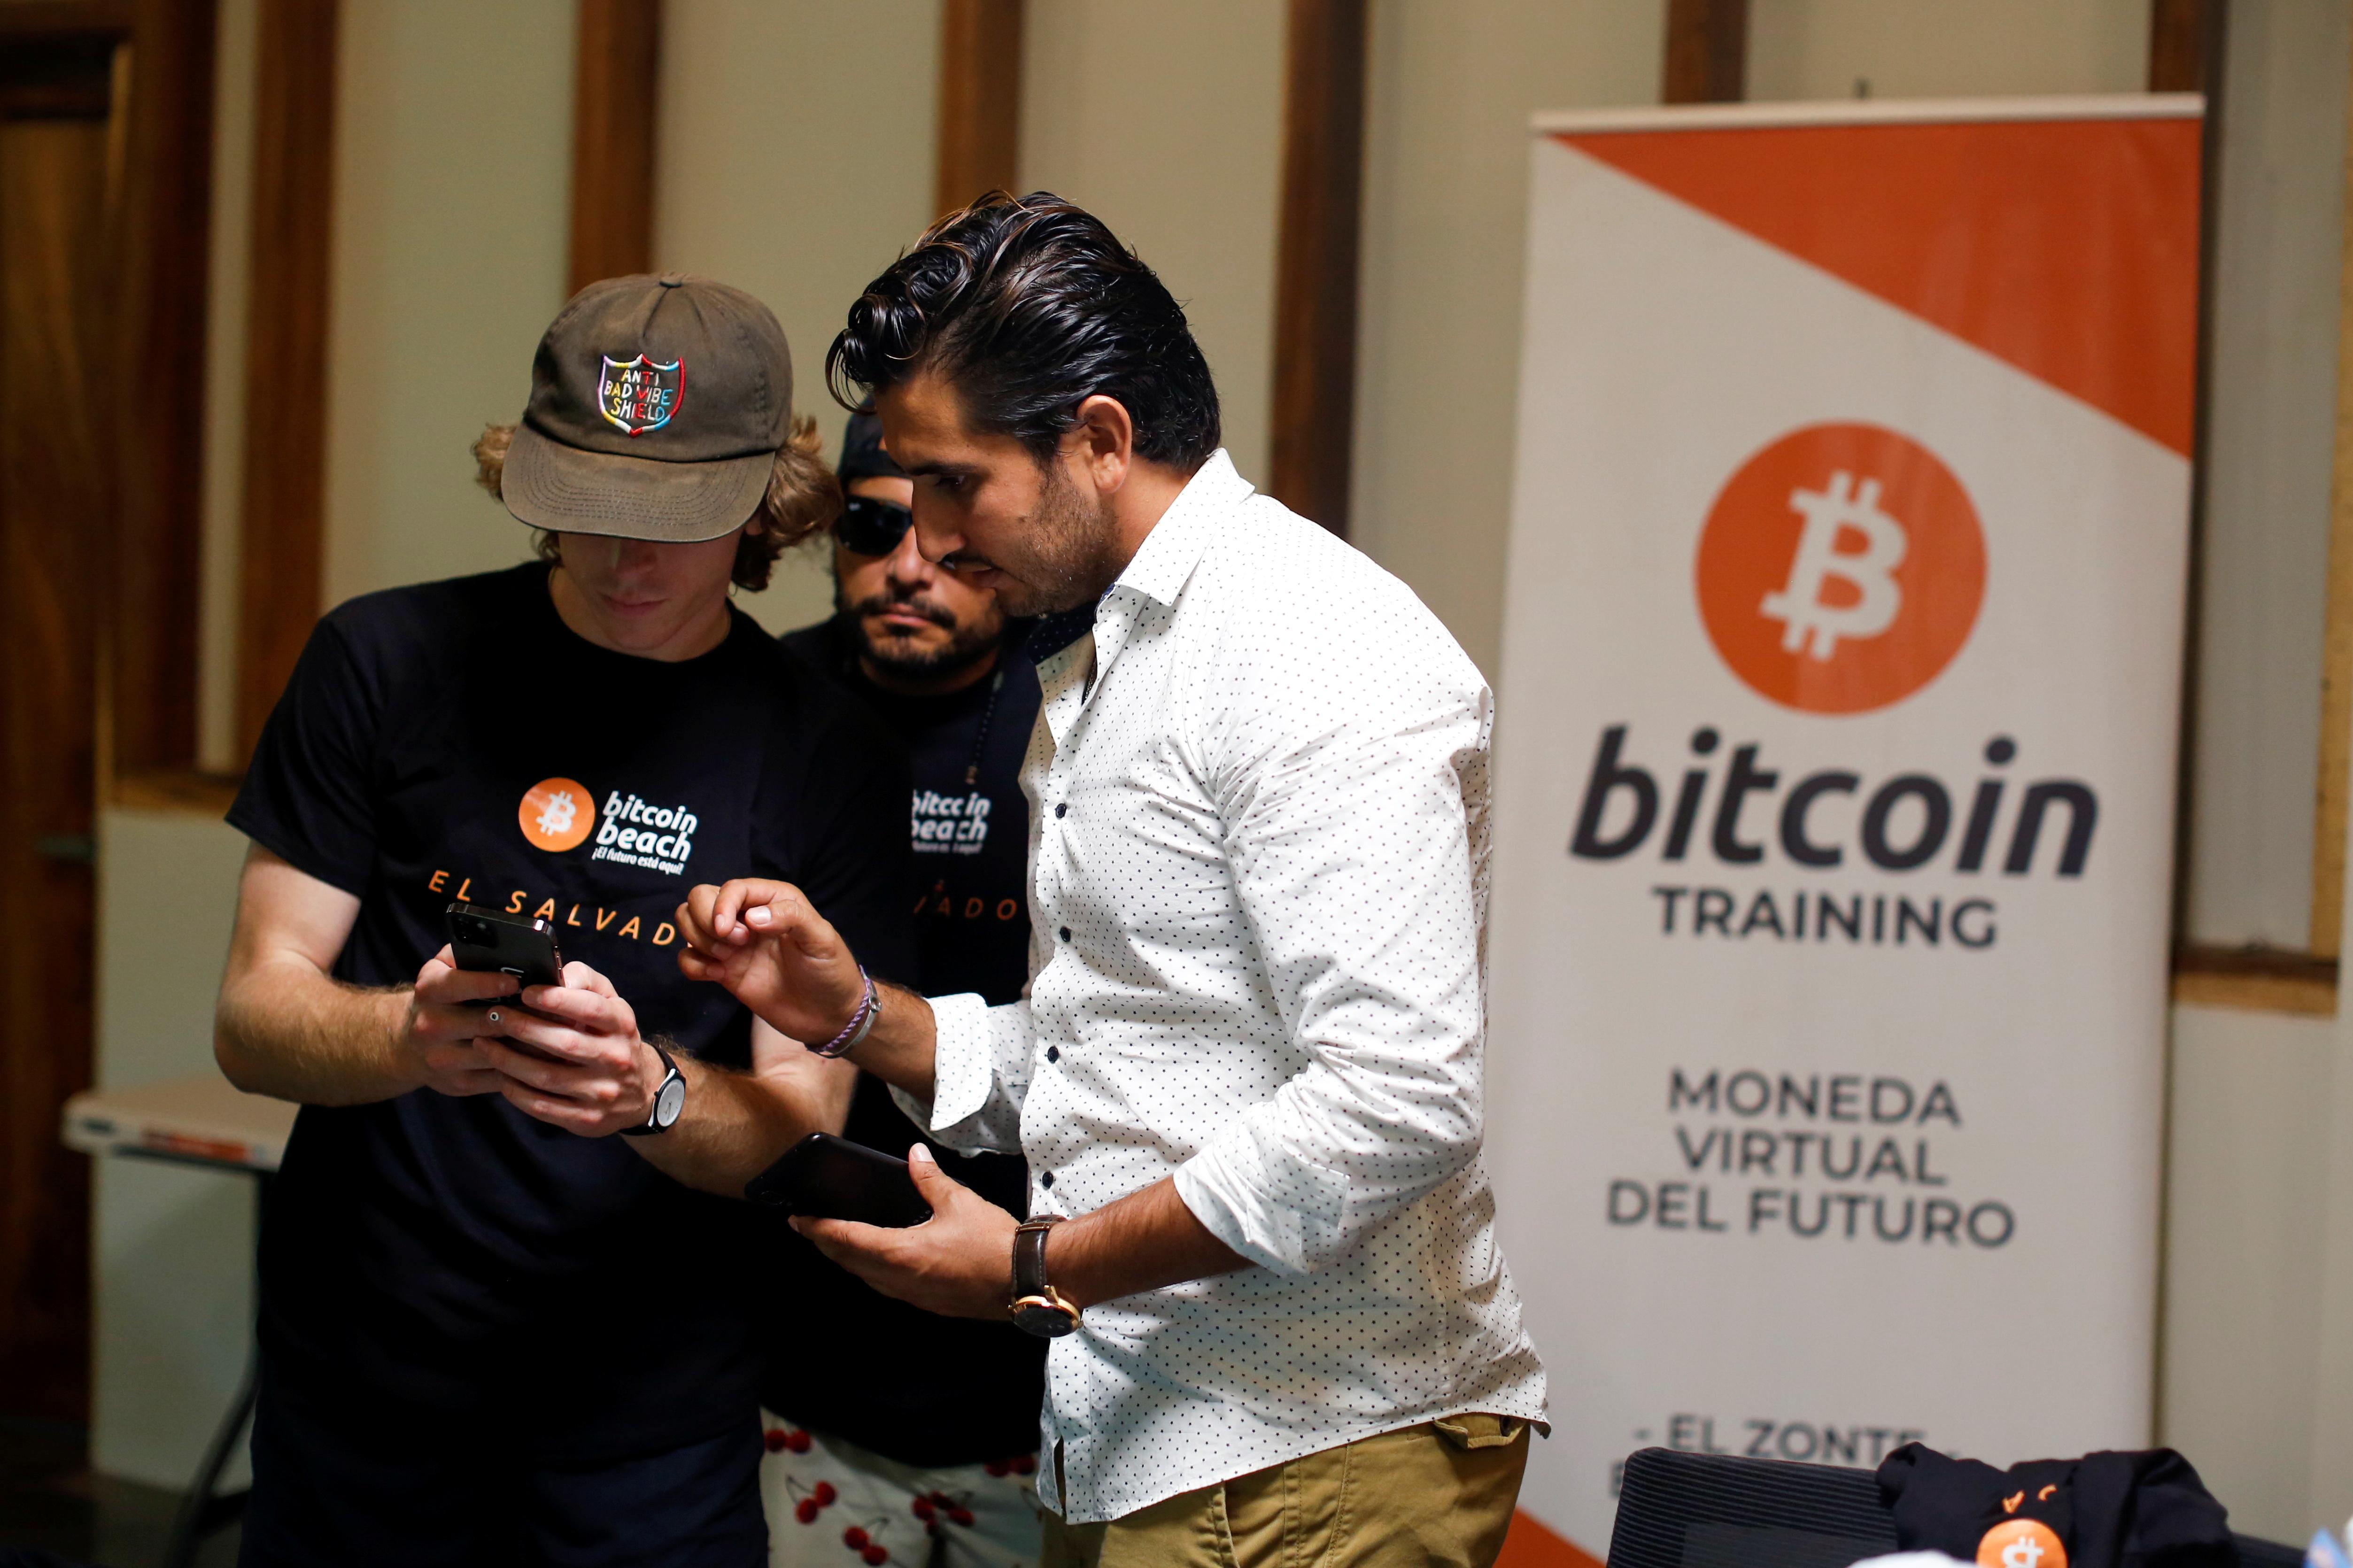 U.S. Bitcoin enthusiast talks with Bitcoin Beach co-founder Roman Martinez at their headquarters at El Zonte Beach in Chiltiupan, El Salvador June 10, 2021. REUTERS/Jose Cabezas